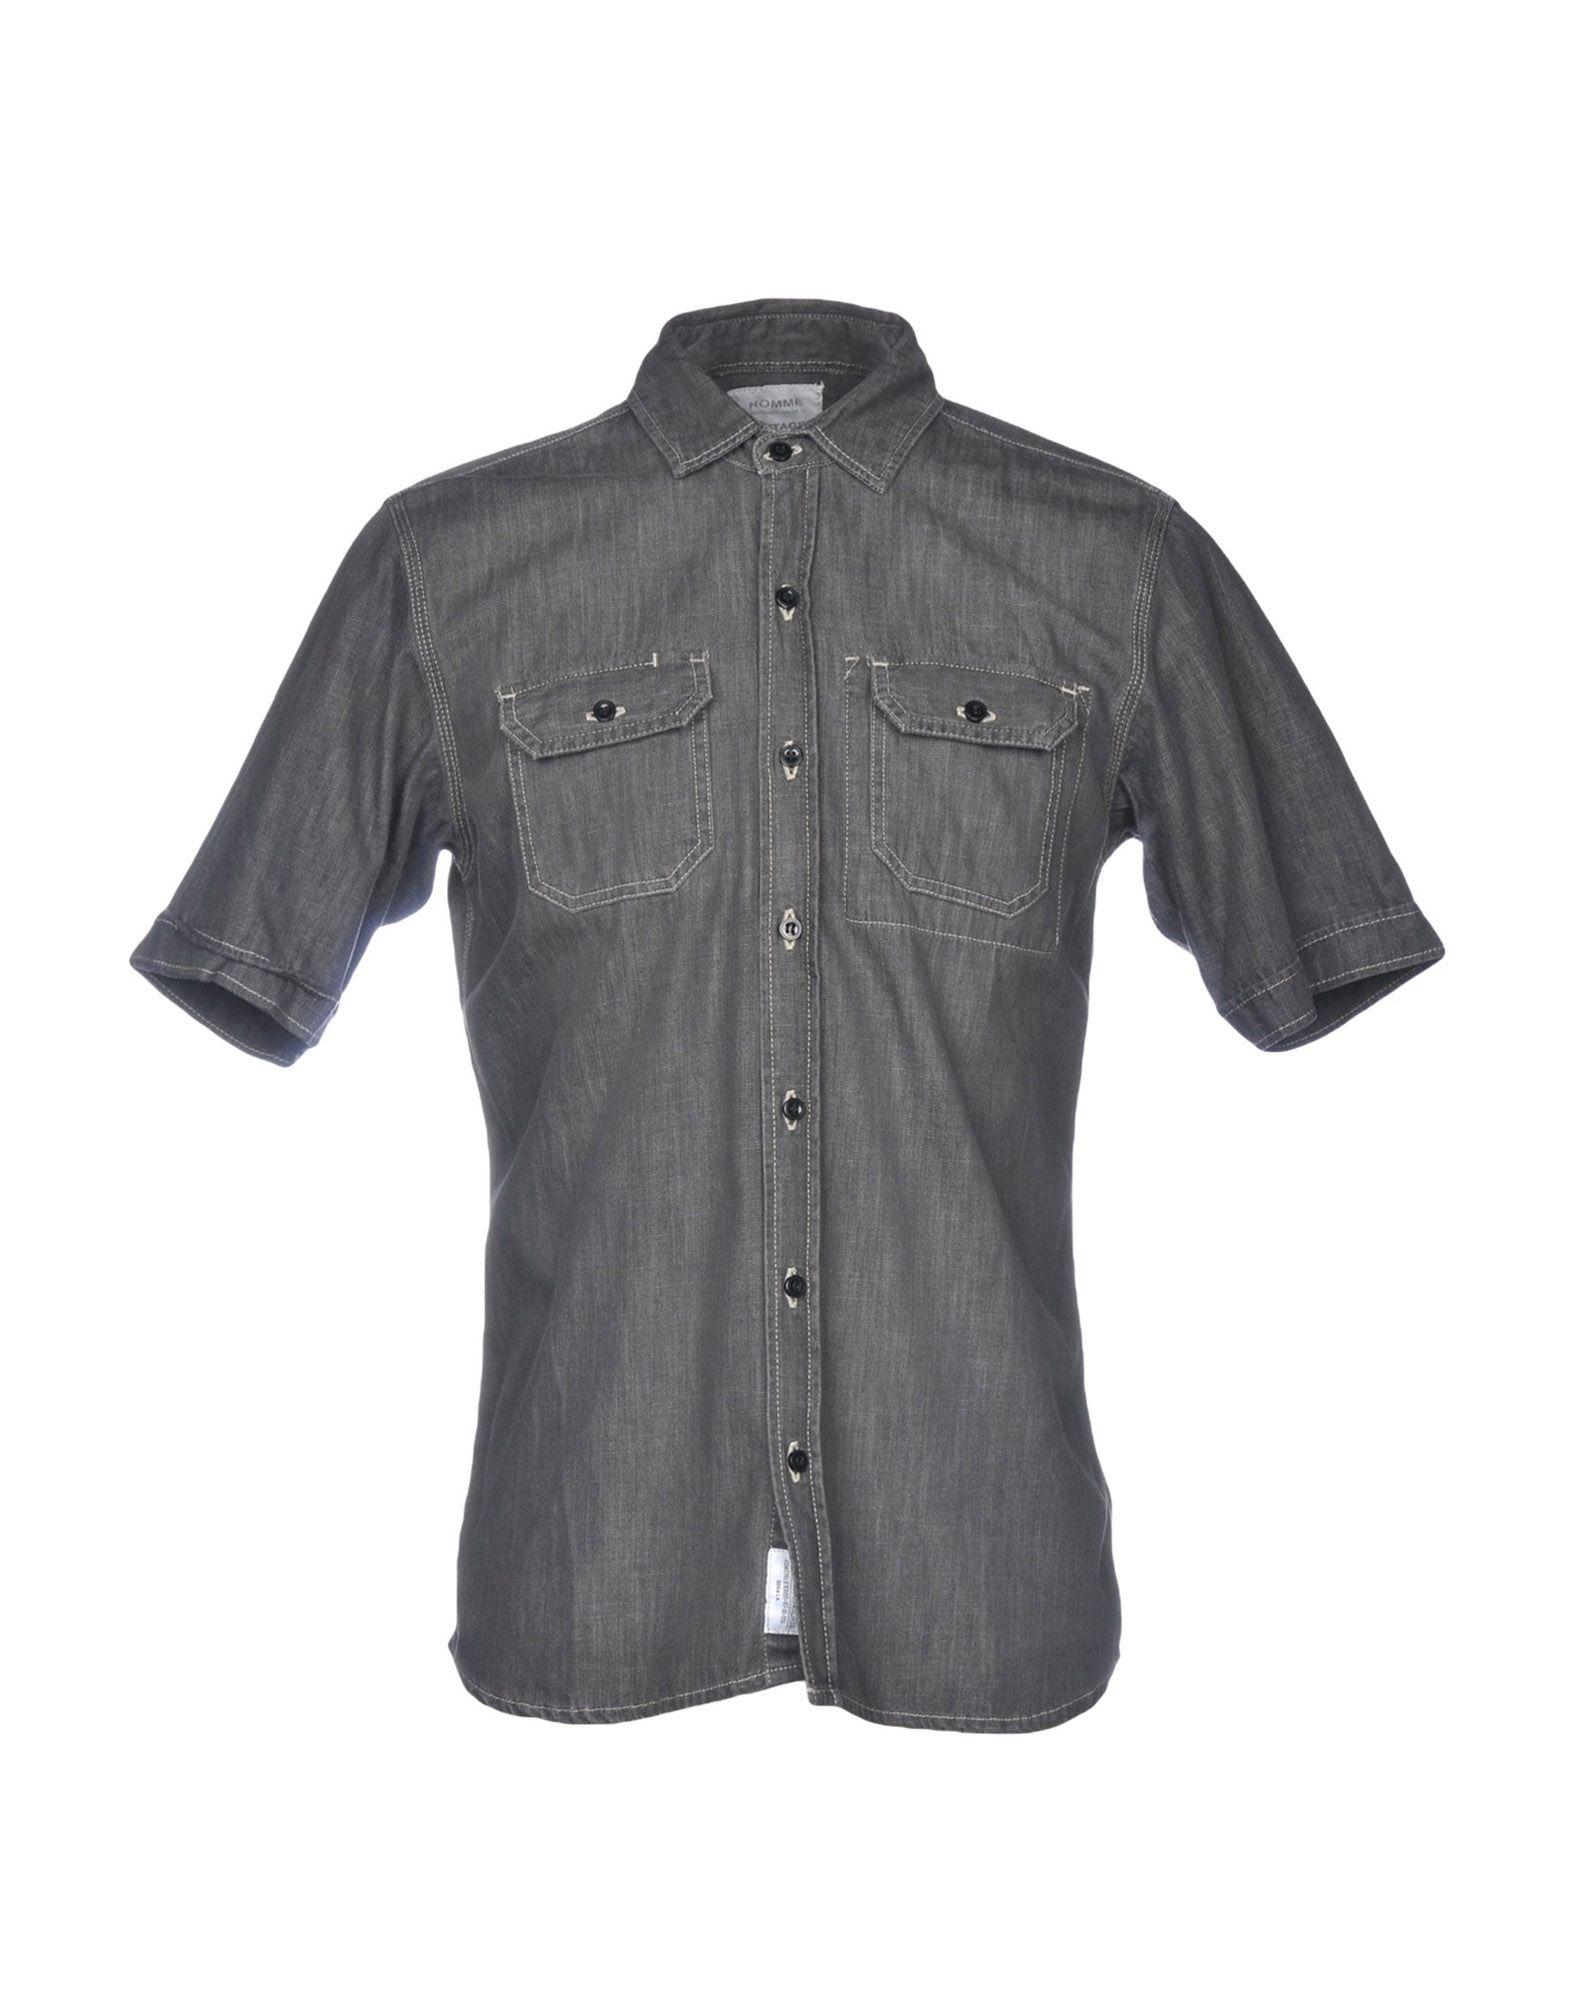 DANIELE ALESSANDRINI HOMME Джинсовая рубашка daniele alessandrini homme джинсовая рубашка